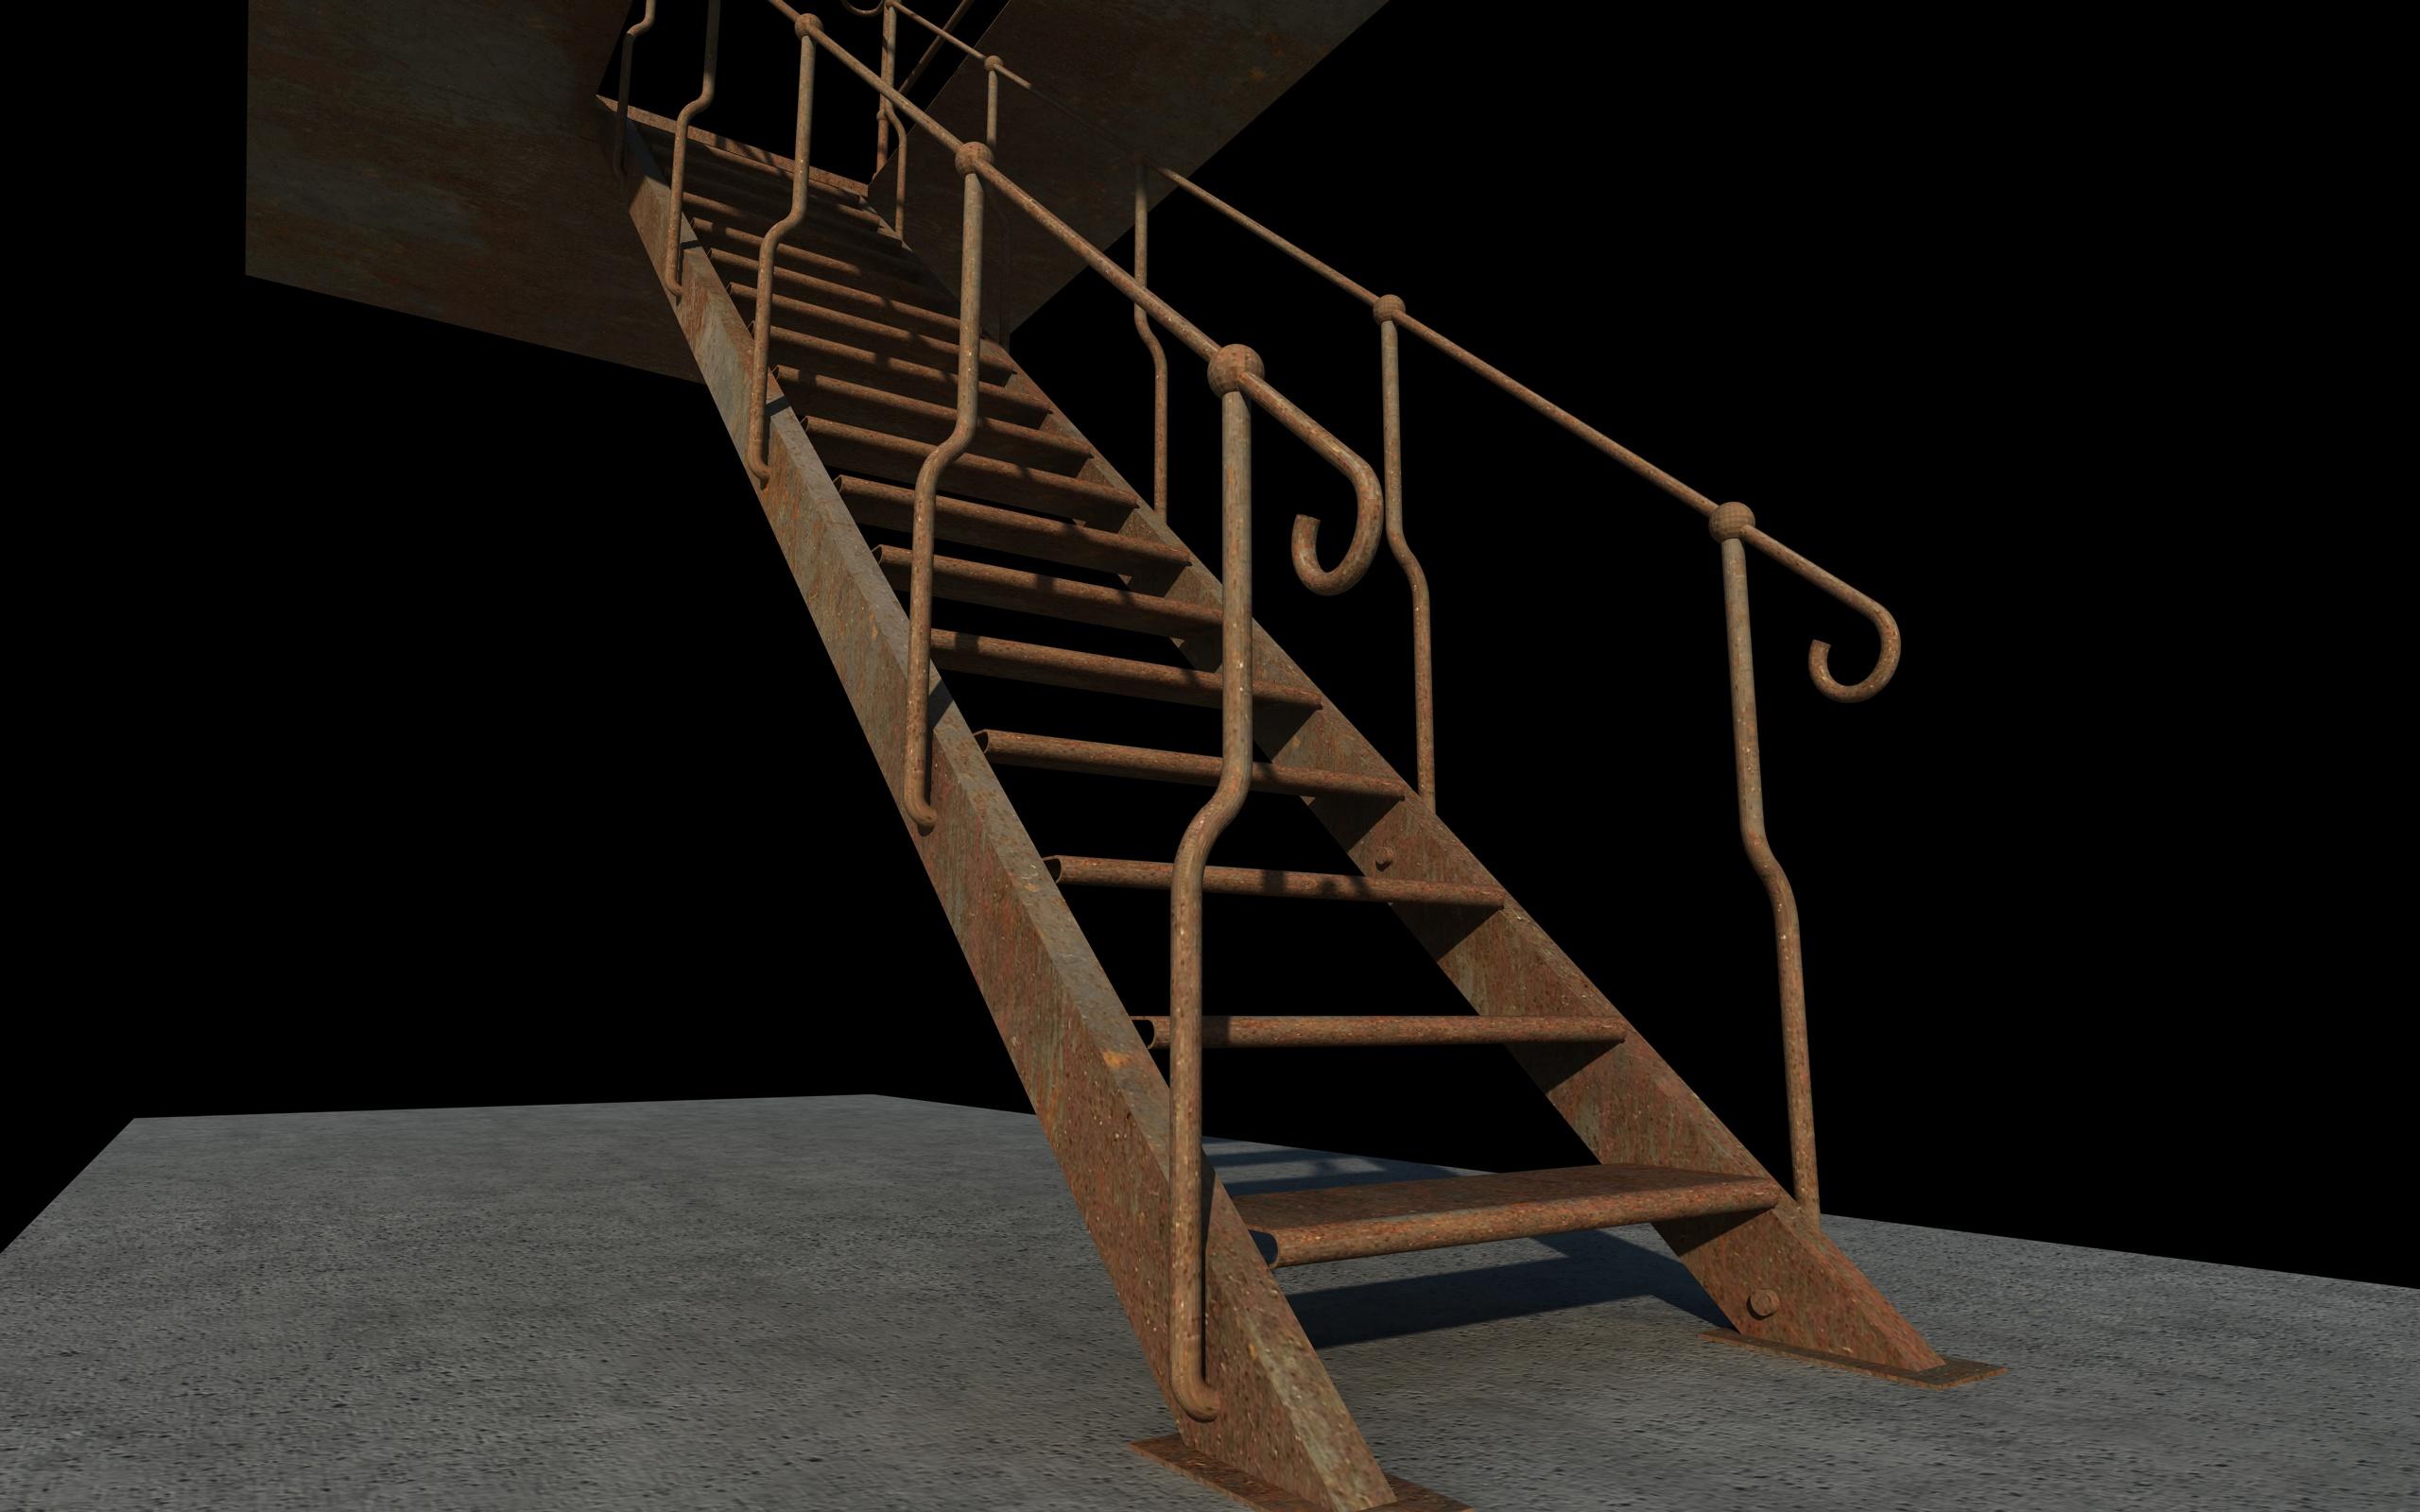 iron stair 3d obj 3d model 3ds dxf c4d skp obj 148397